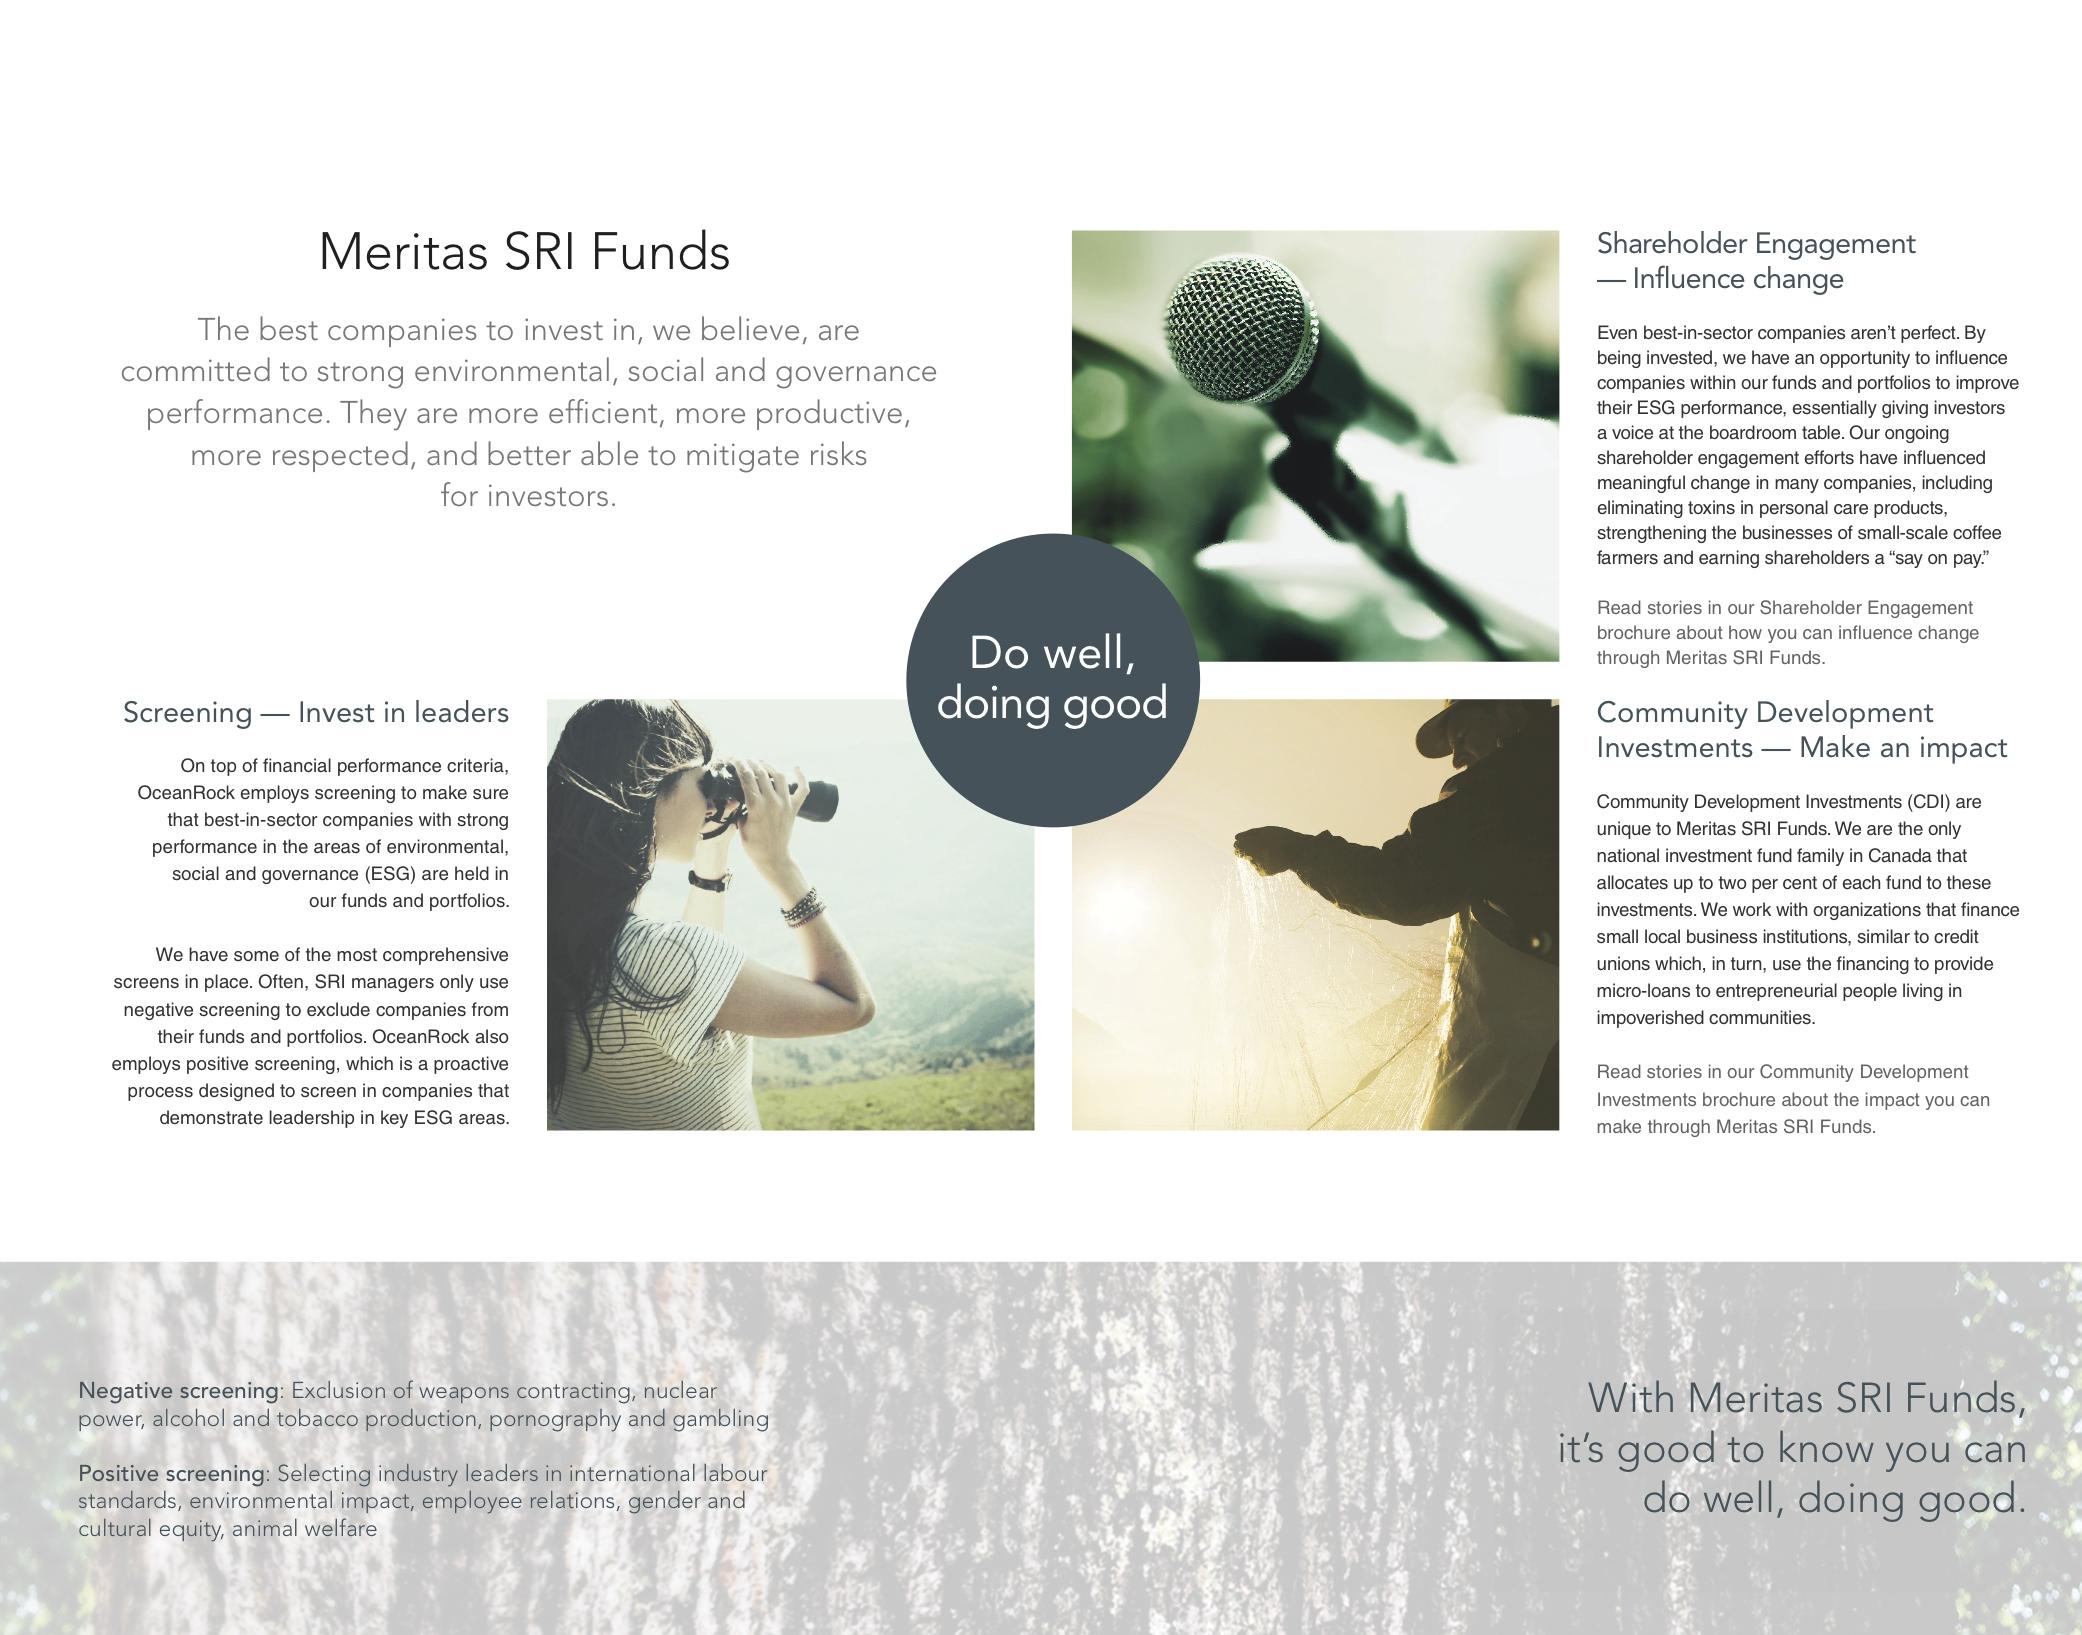 ORII_SRI-brochure_1.1_print-ready-3.jpg